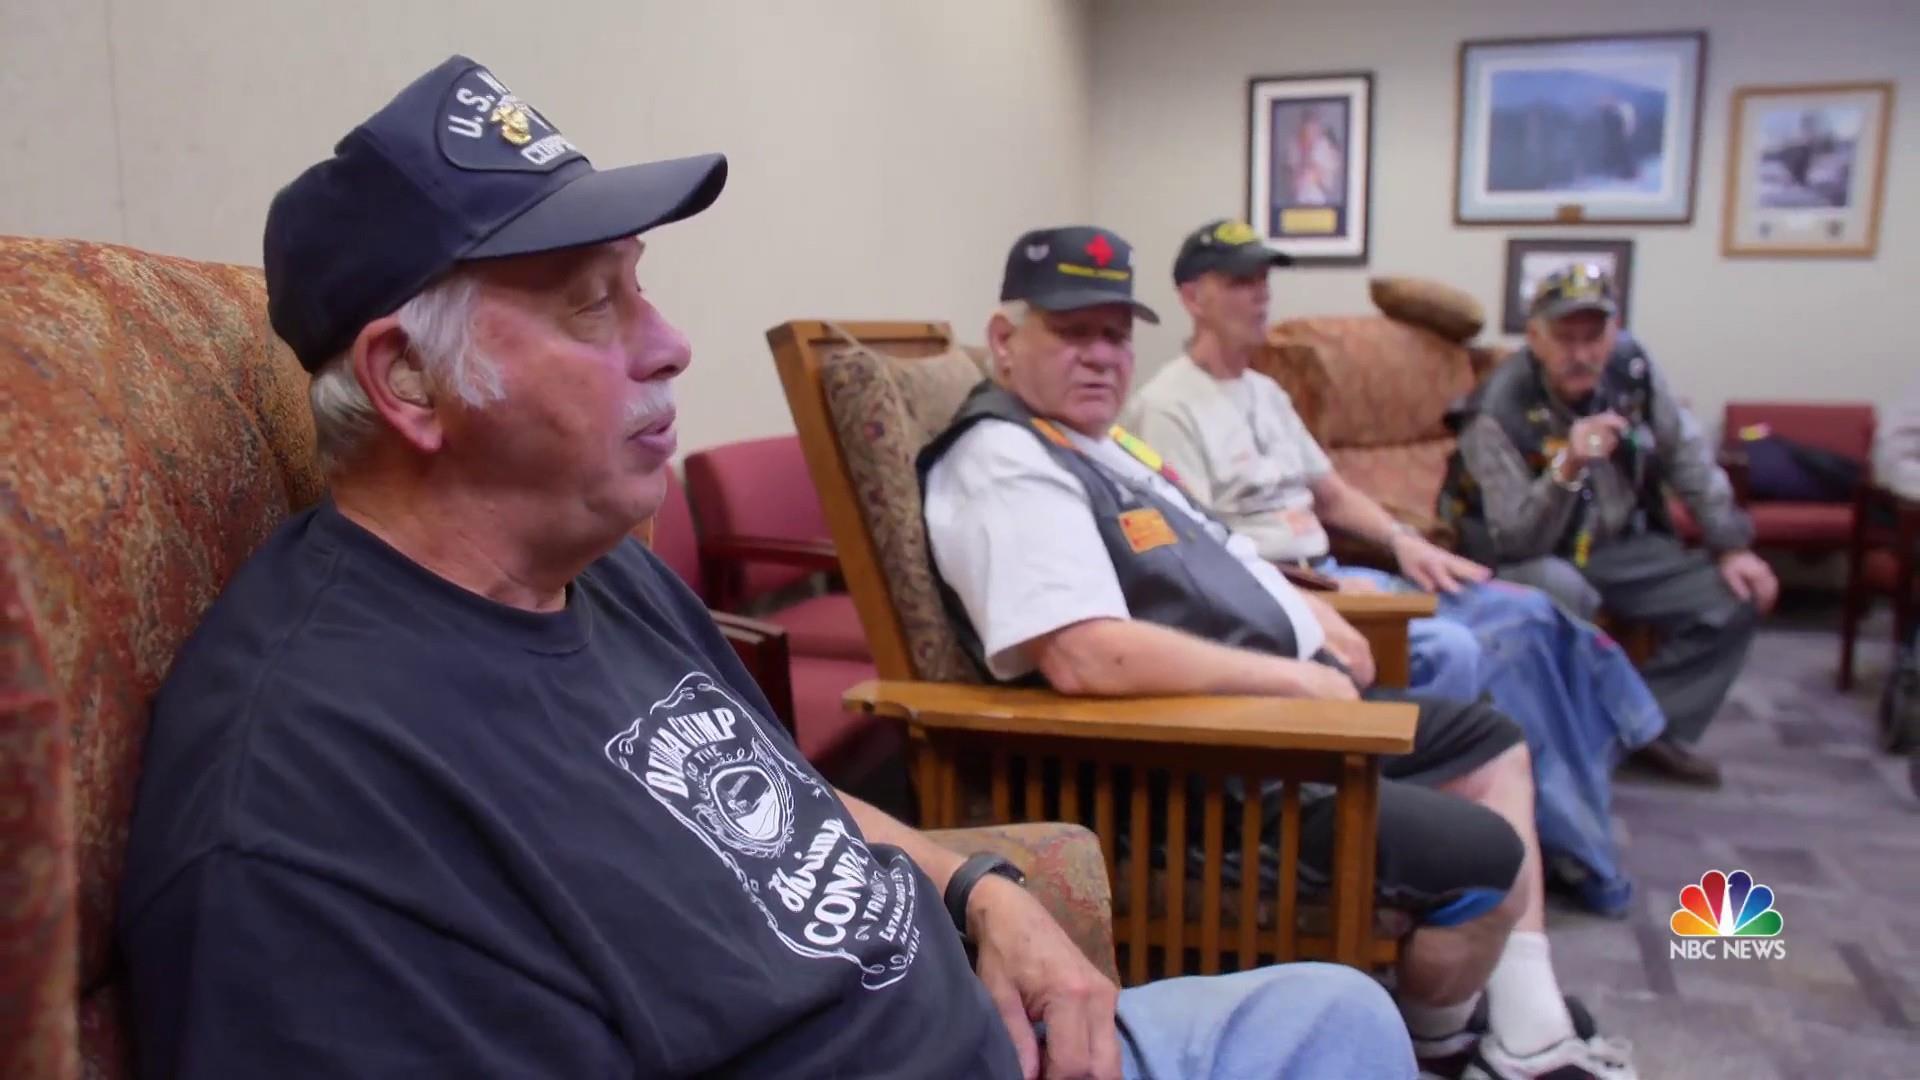 Nationwide Vet Centers help combat veterans readjust to everyday life